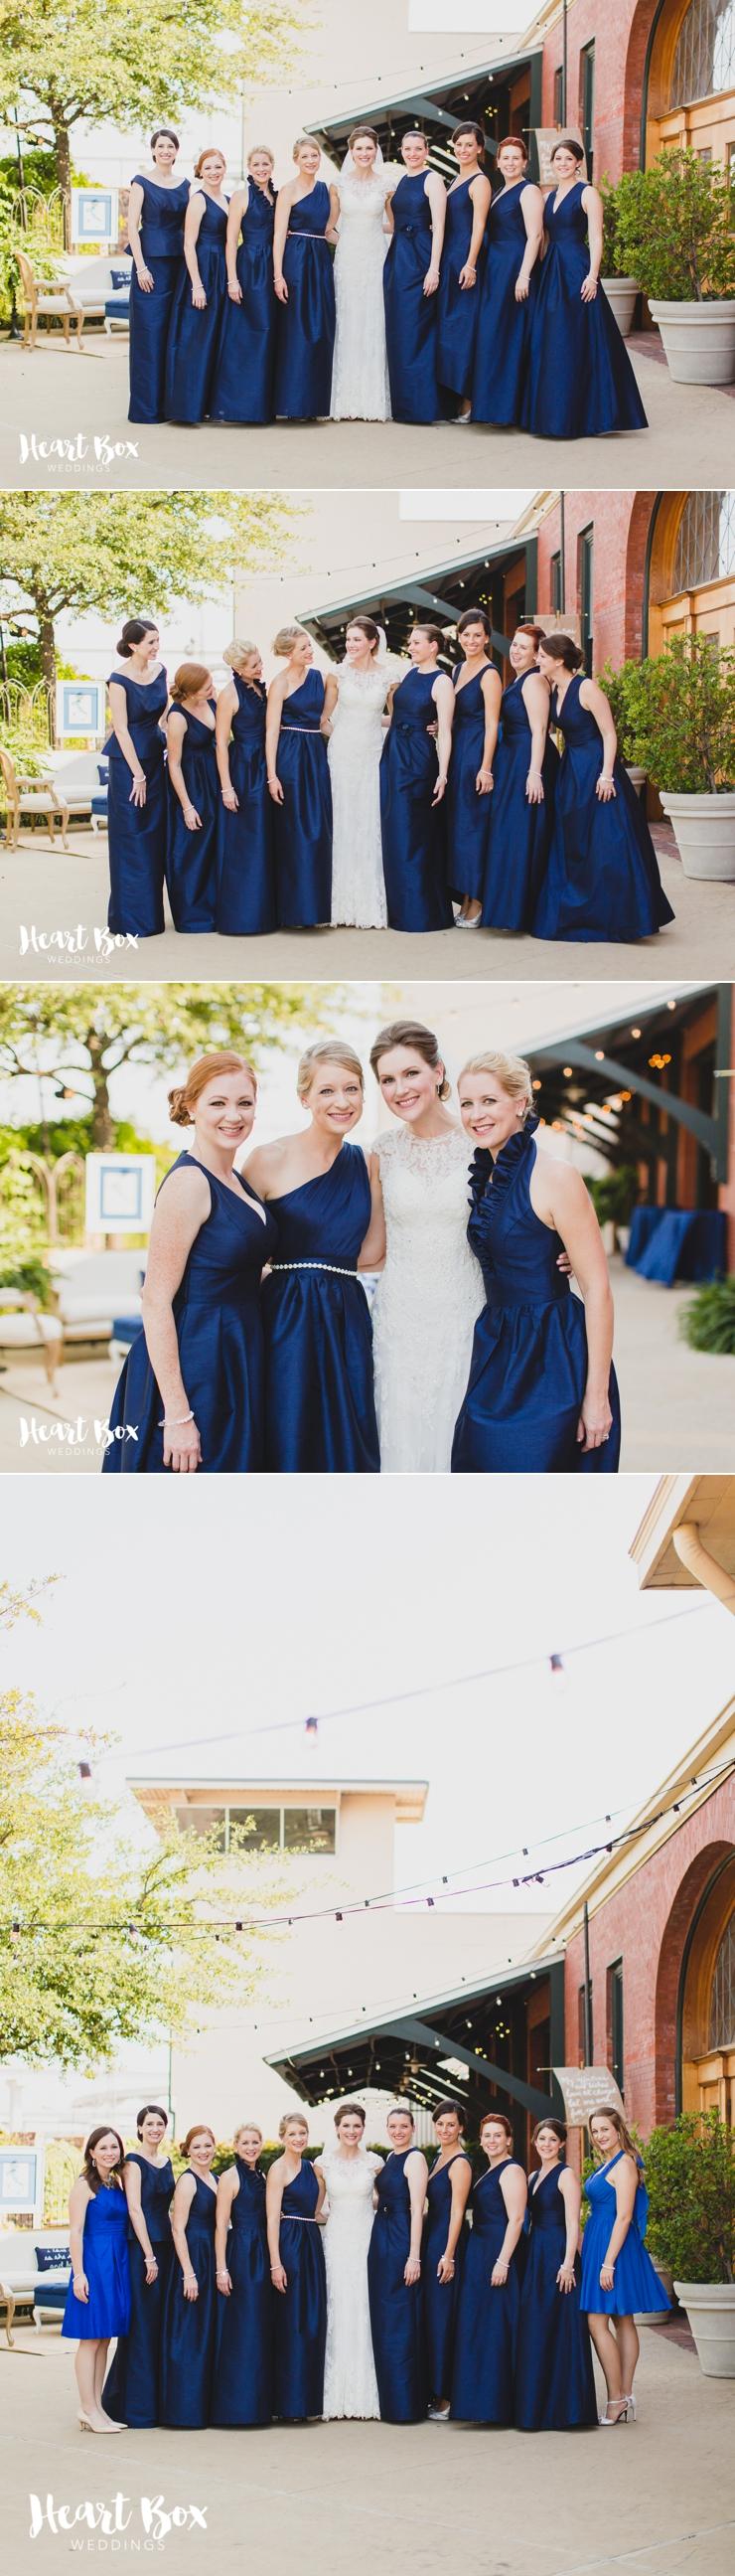 Anthony Wedding Blog Collages 8.jpg